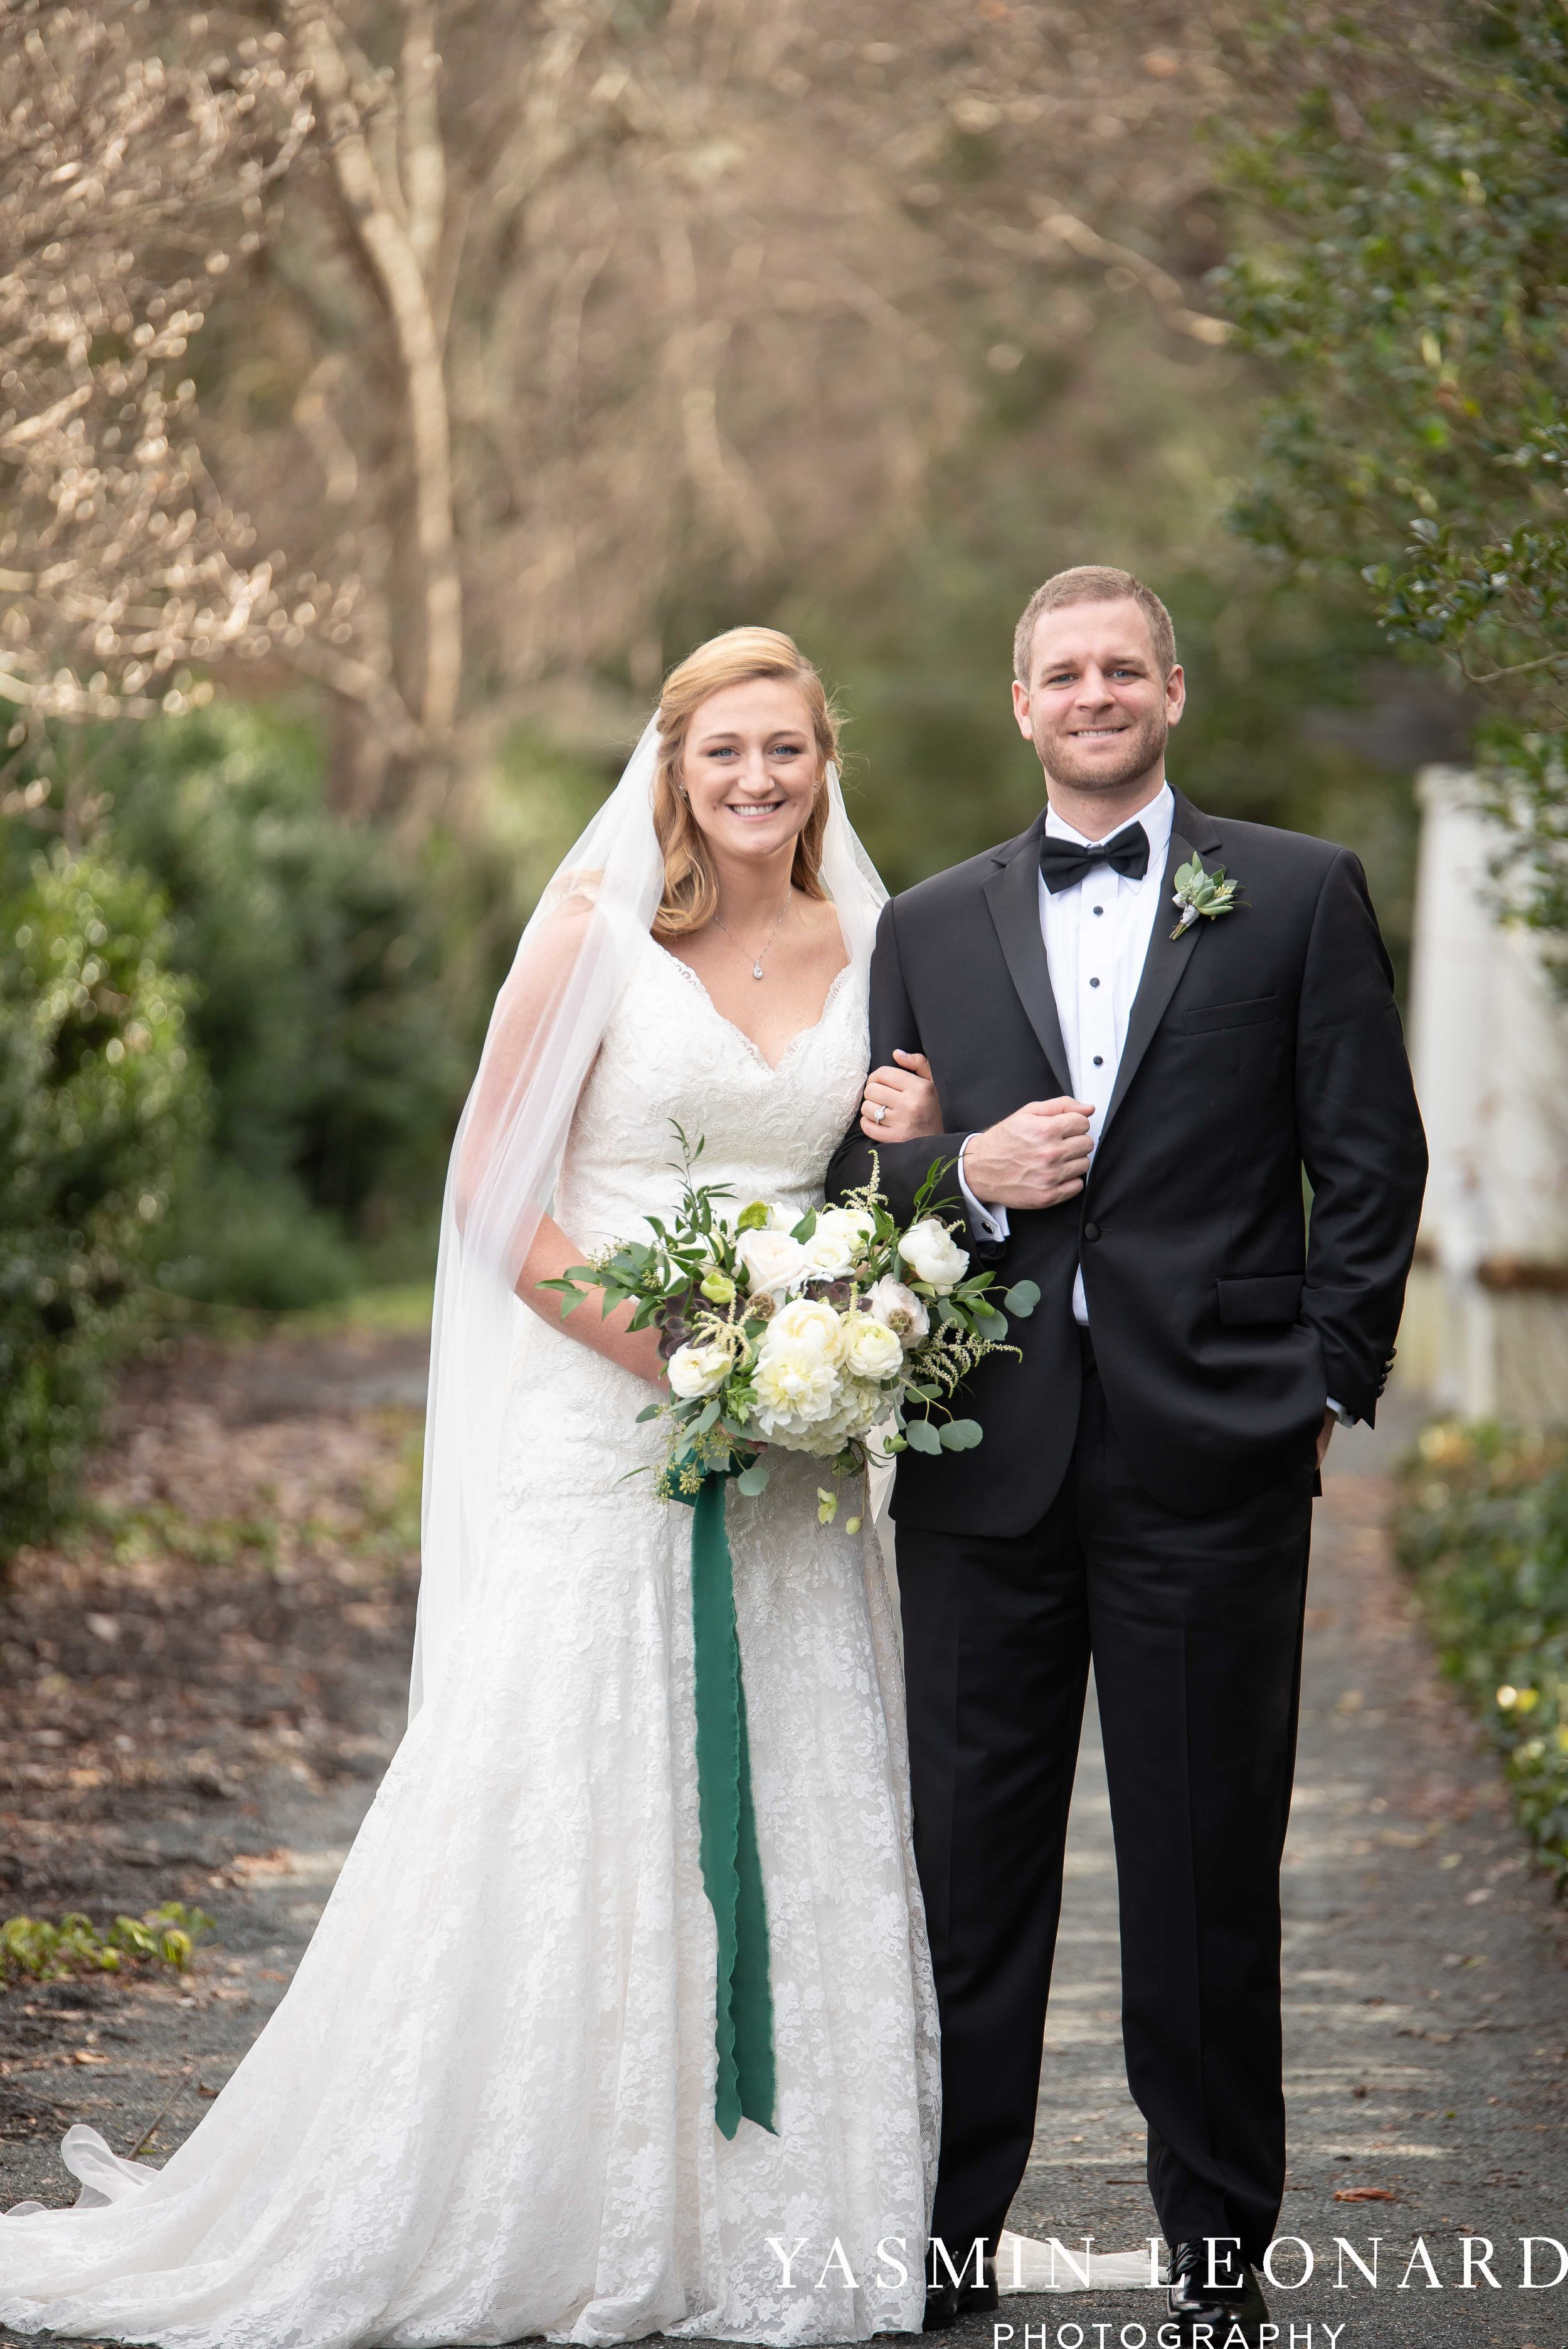 Barn at Reynolda Village - Winston Salem Wedding - White and Green Wedding - NC Wedding - NC Barns - Yasmin Leonard Photography-23.jpg